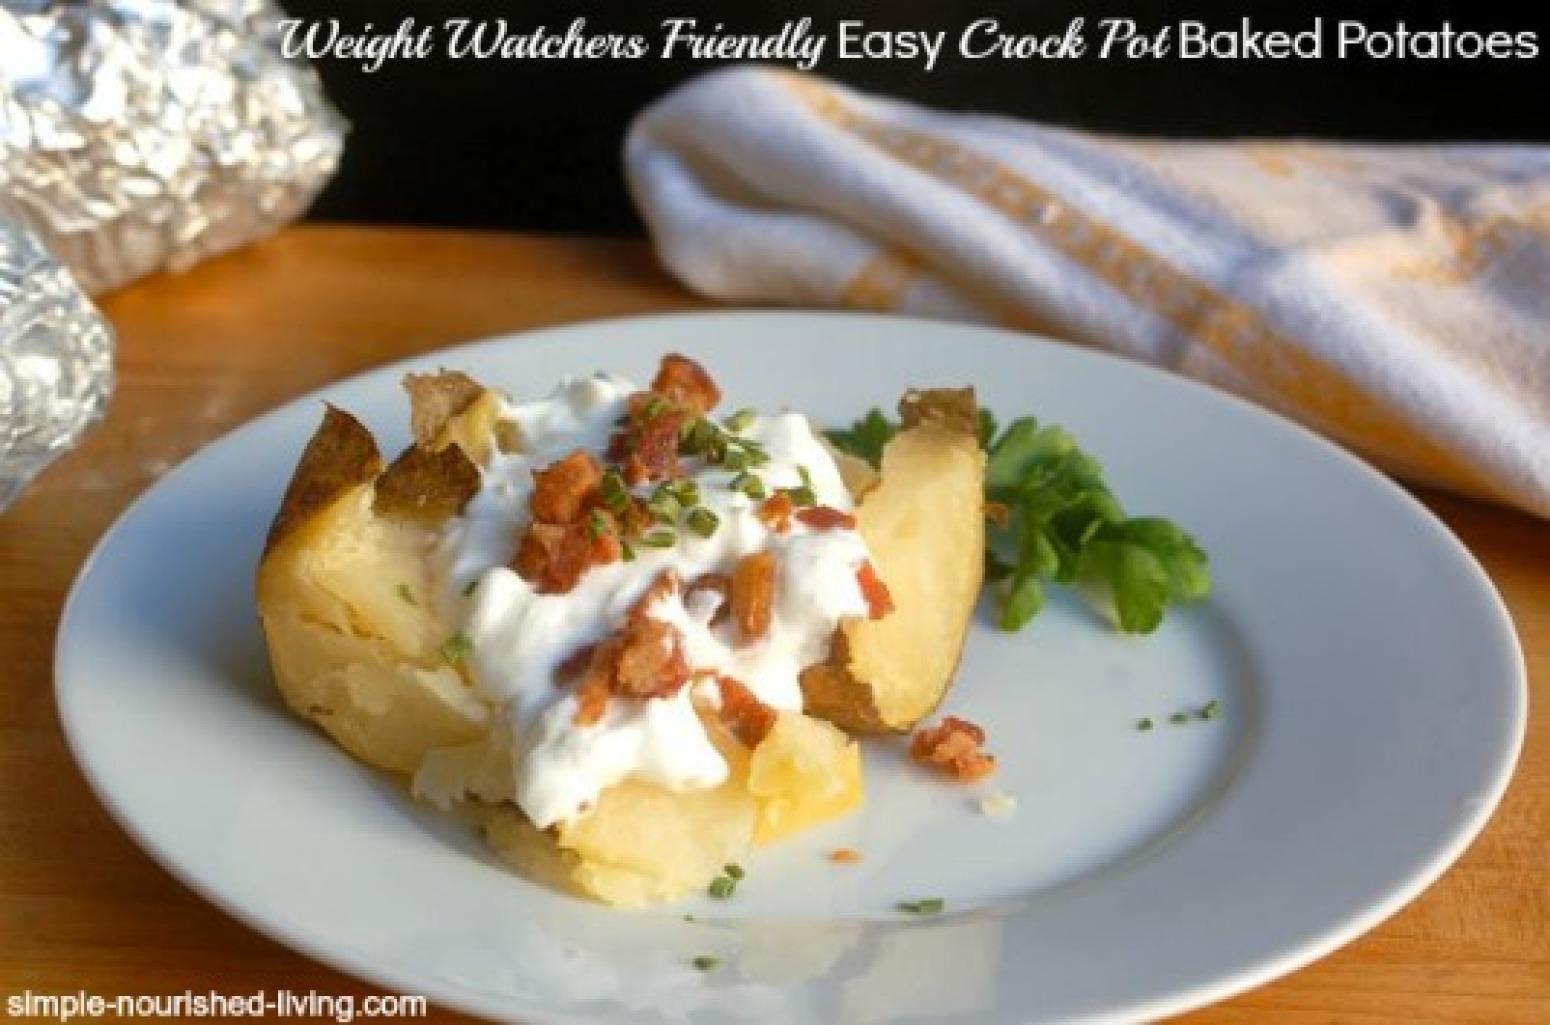 Easy Crock Pot Baked Potatoes Recipe | Just A Pinch Recipes